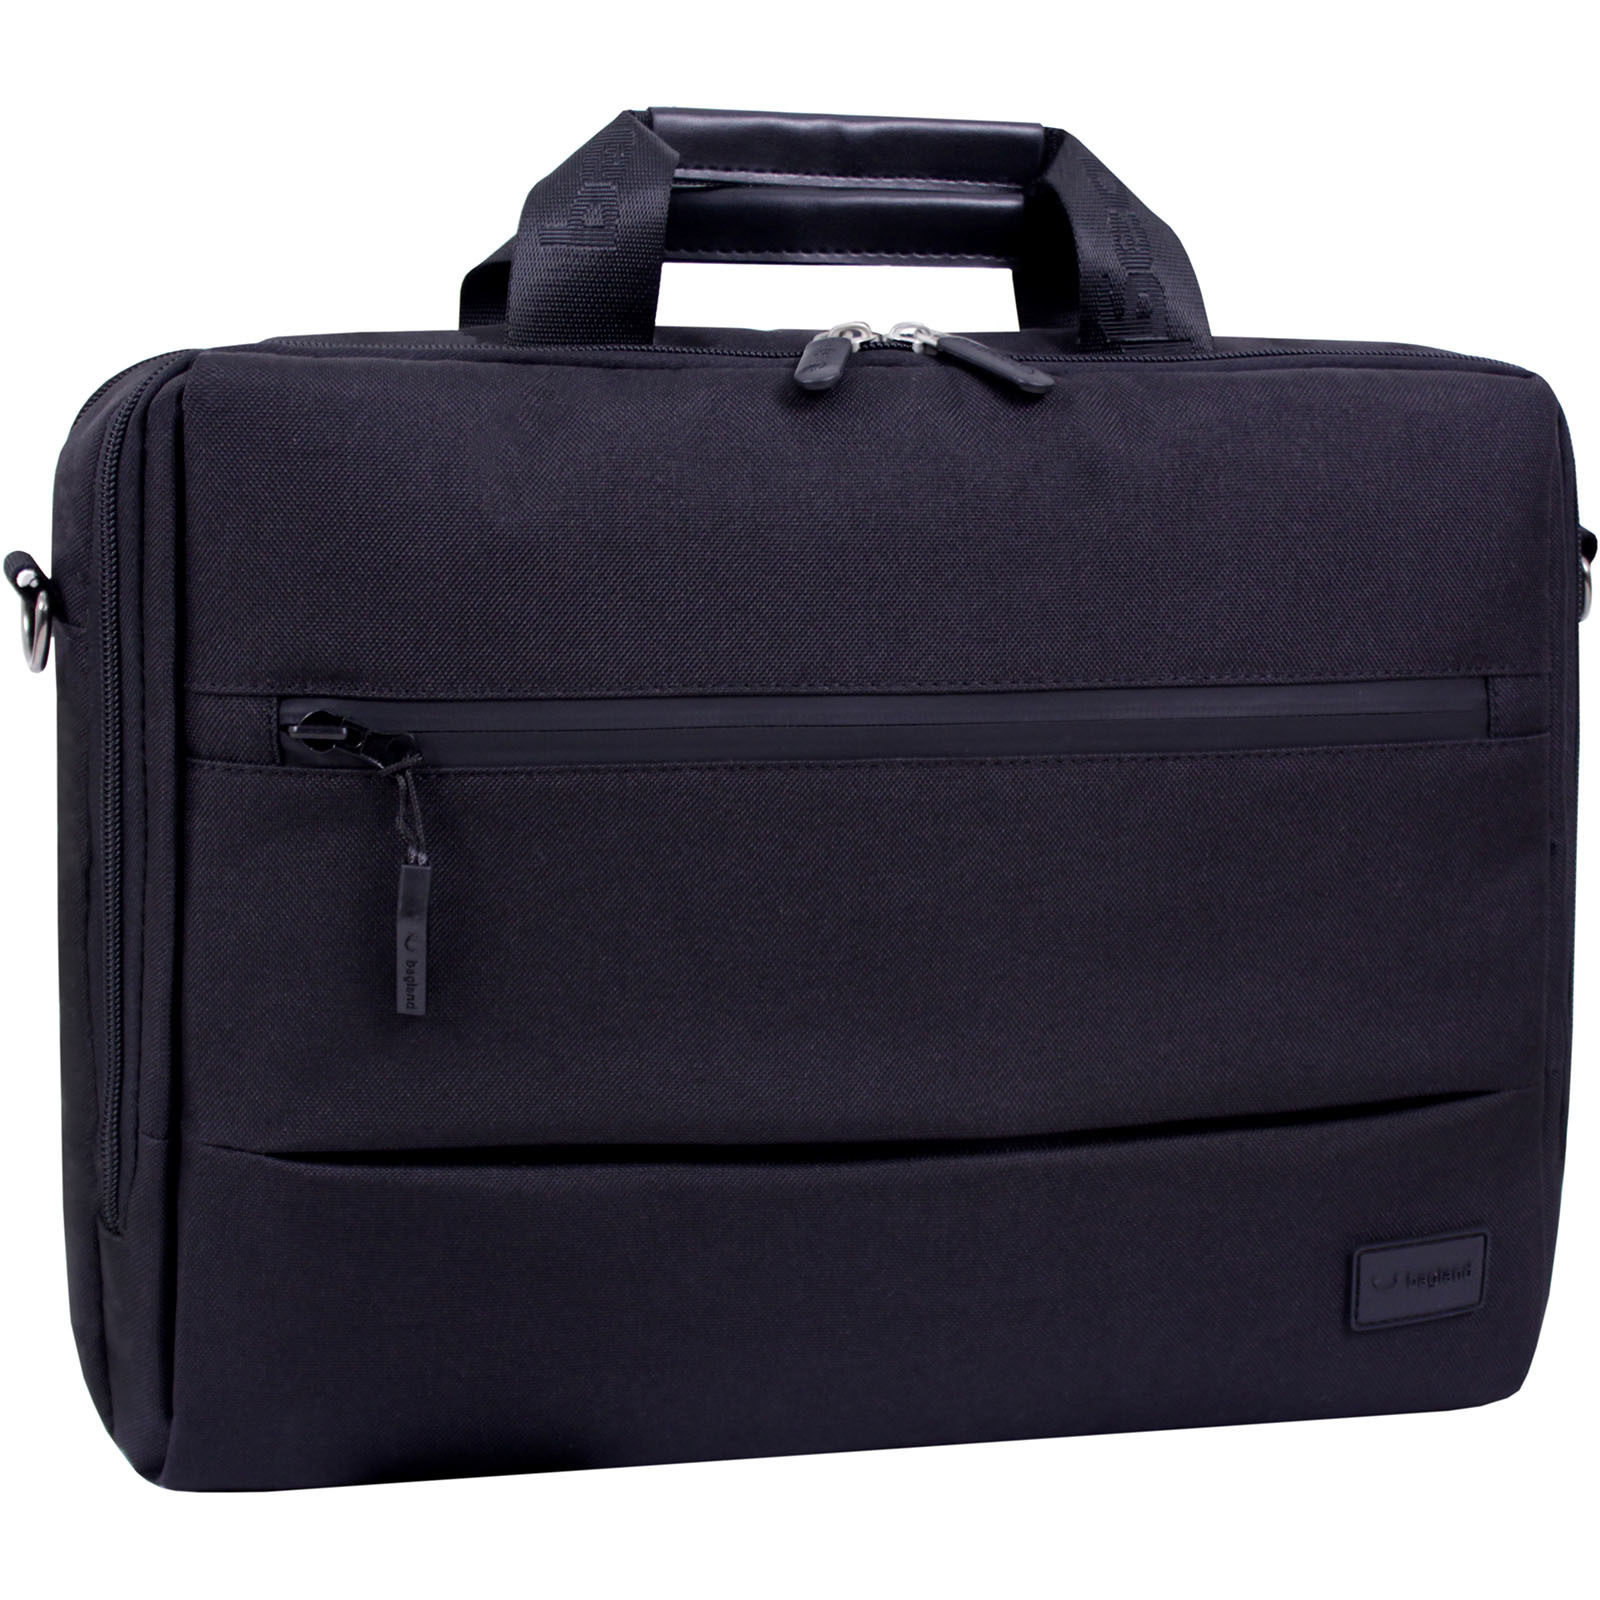 Сумки для ноутбука Сумка для ноутбука Bagland Континет 7 л. черный (0044066) IMG_6767.JPG